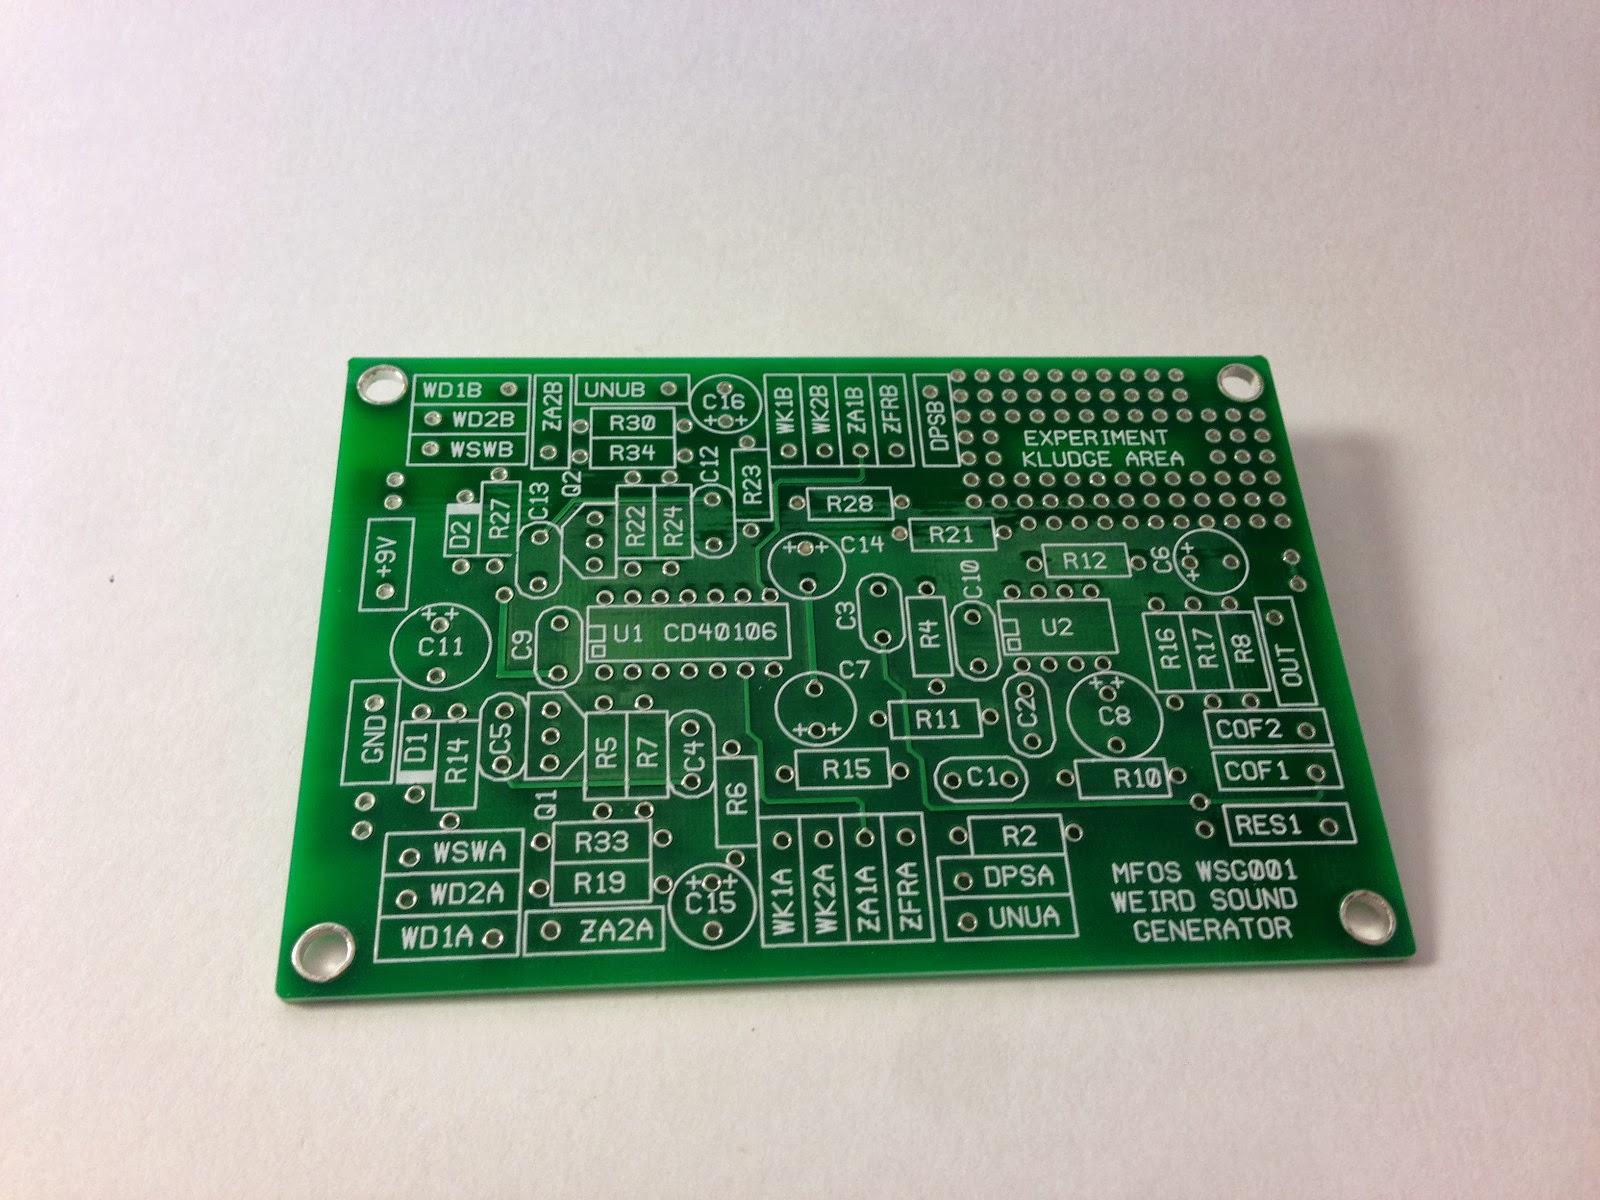 MATRIXSYNTH: MFOS Weird Sound Generator (DIY SYNTH) Kit